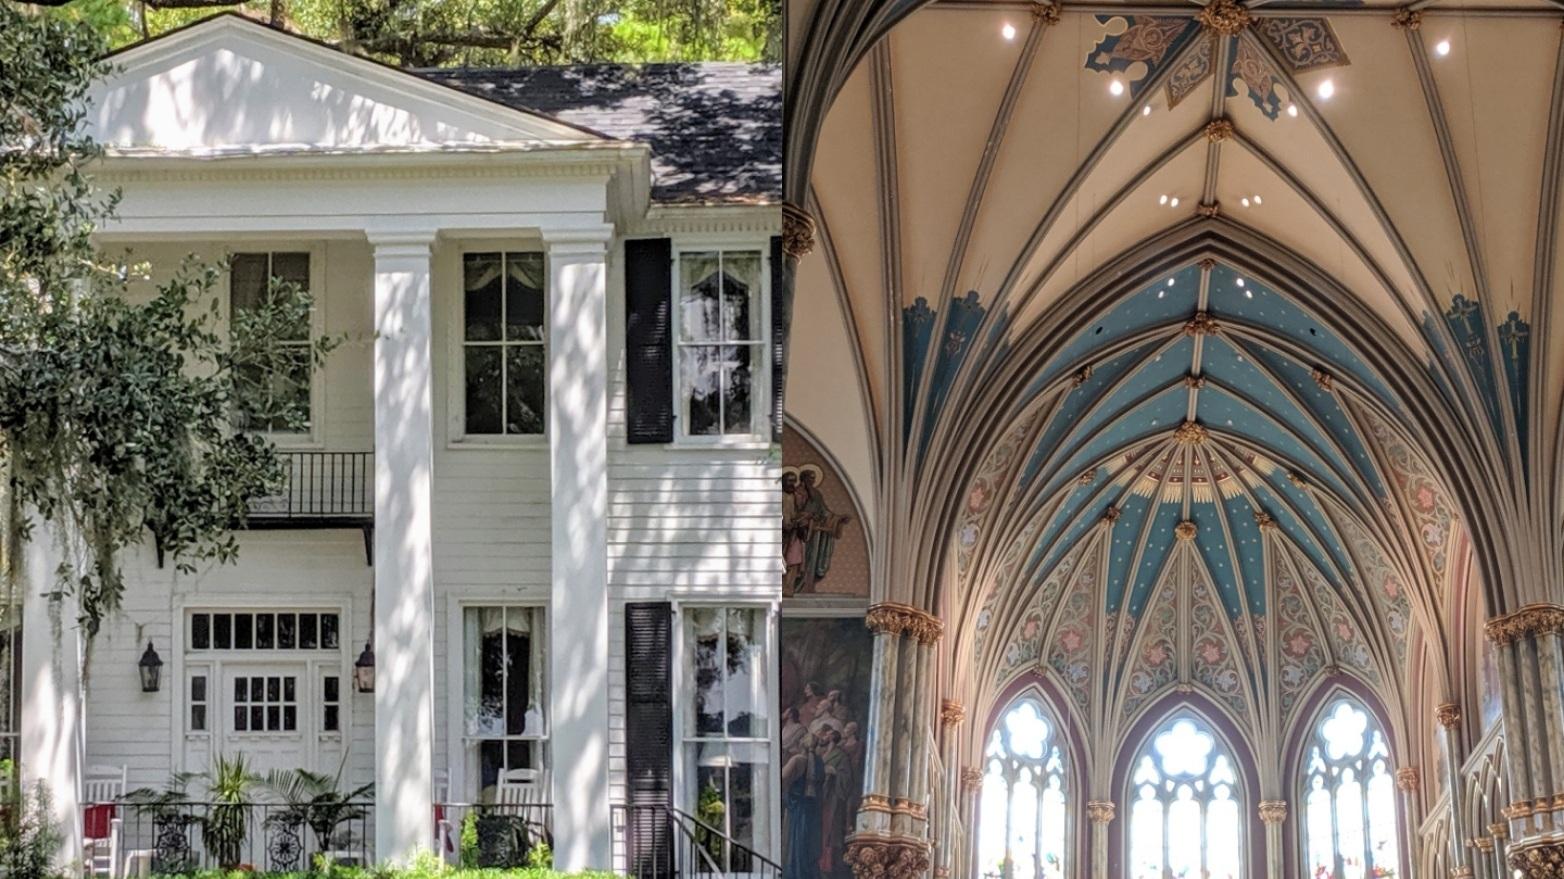 savannah style - homes, churches & plantations -